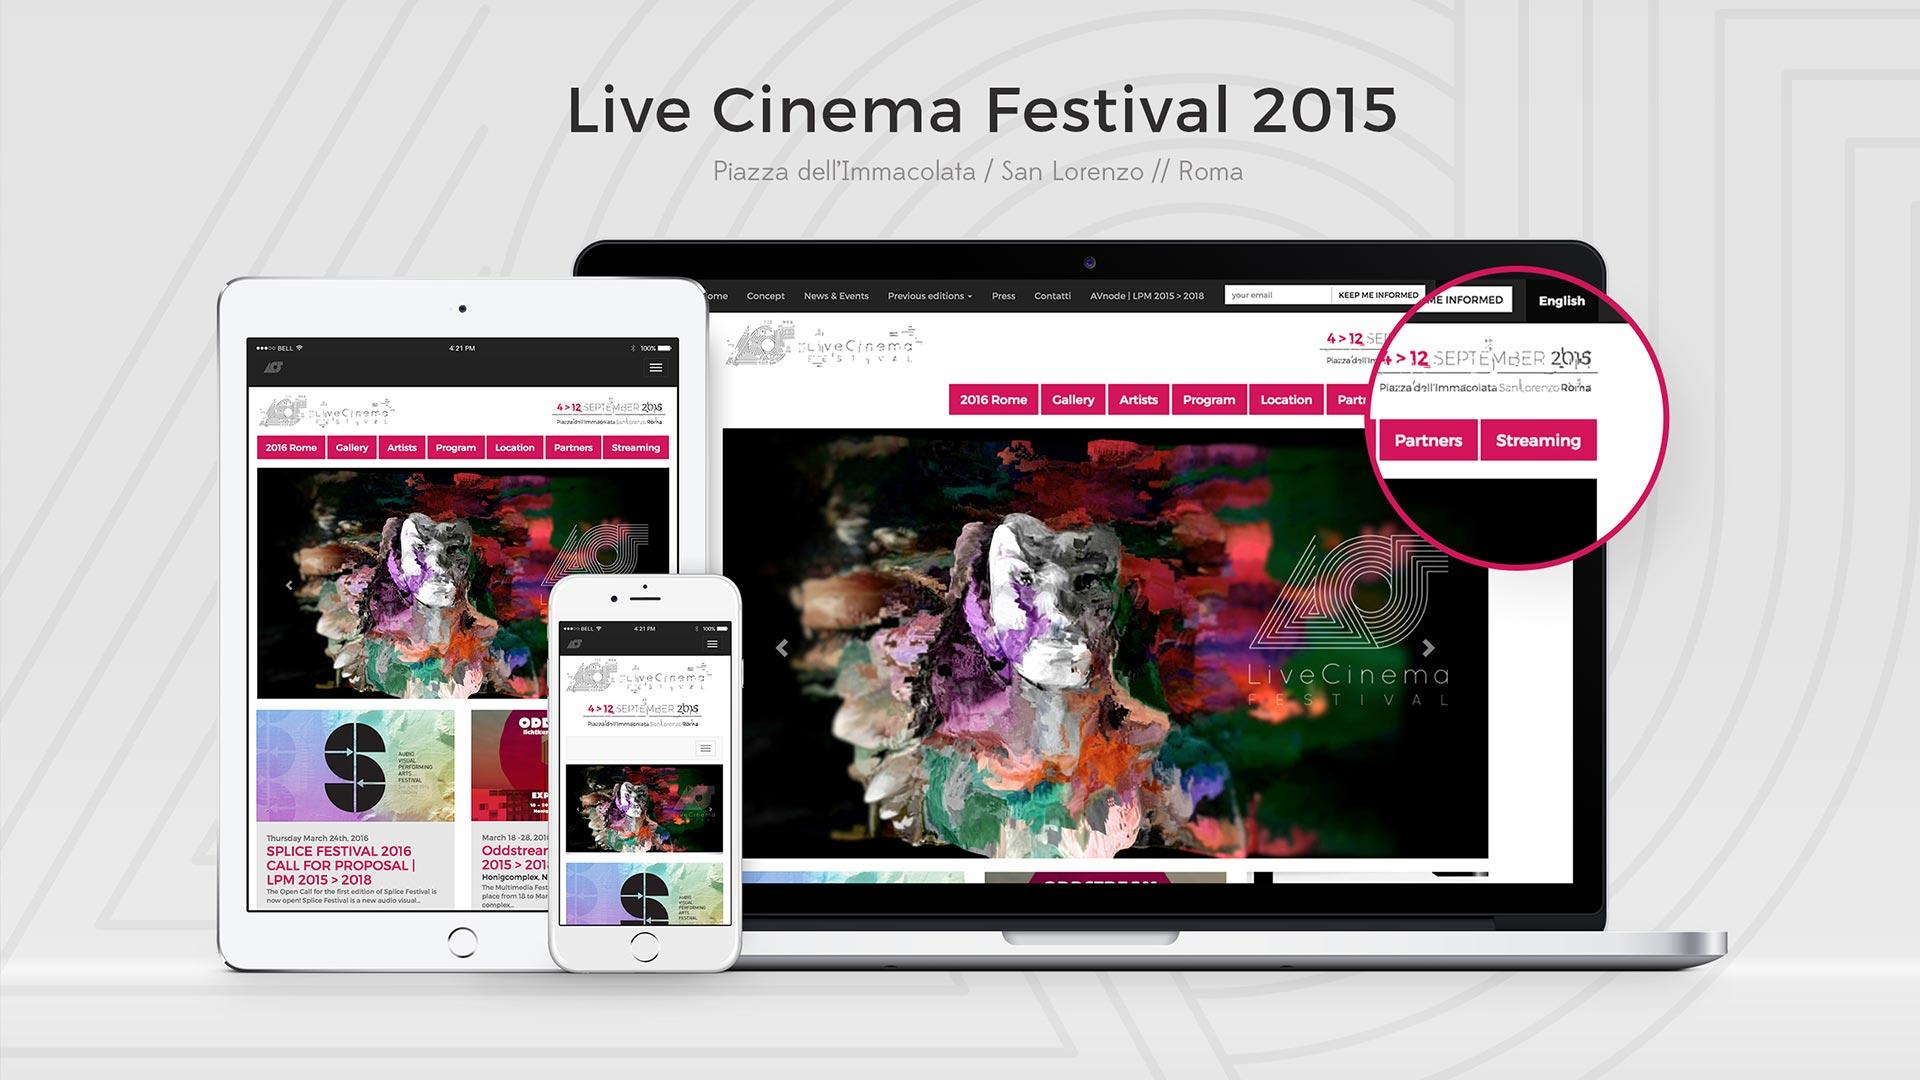 Live Cinema Festival 2015 – Web Site